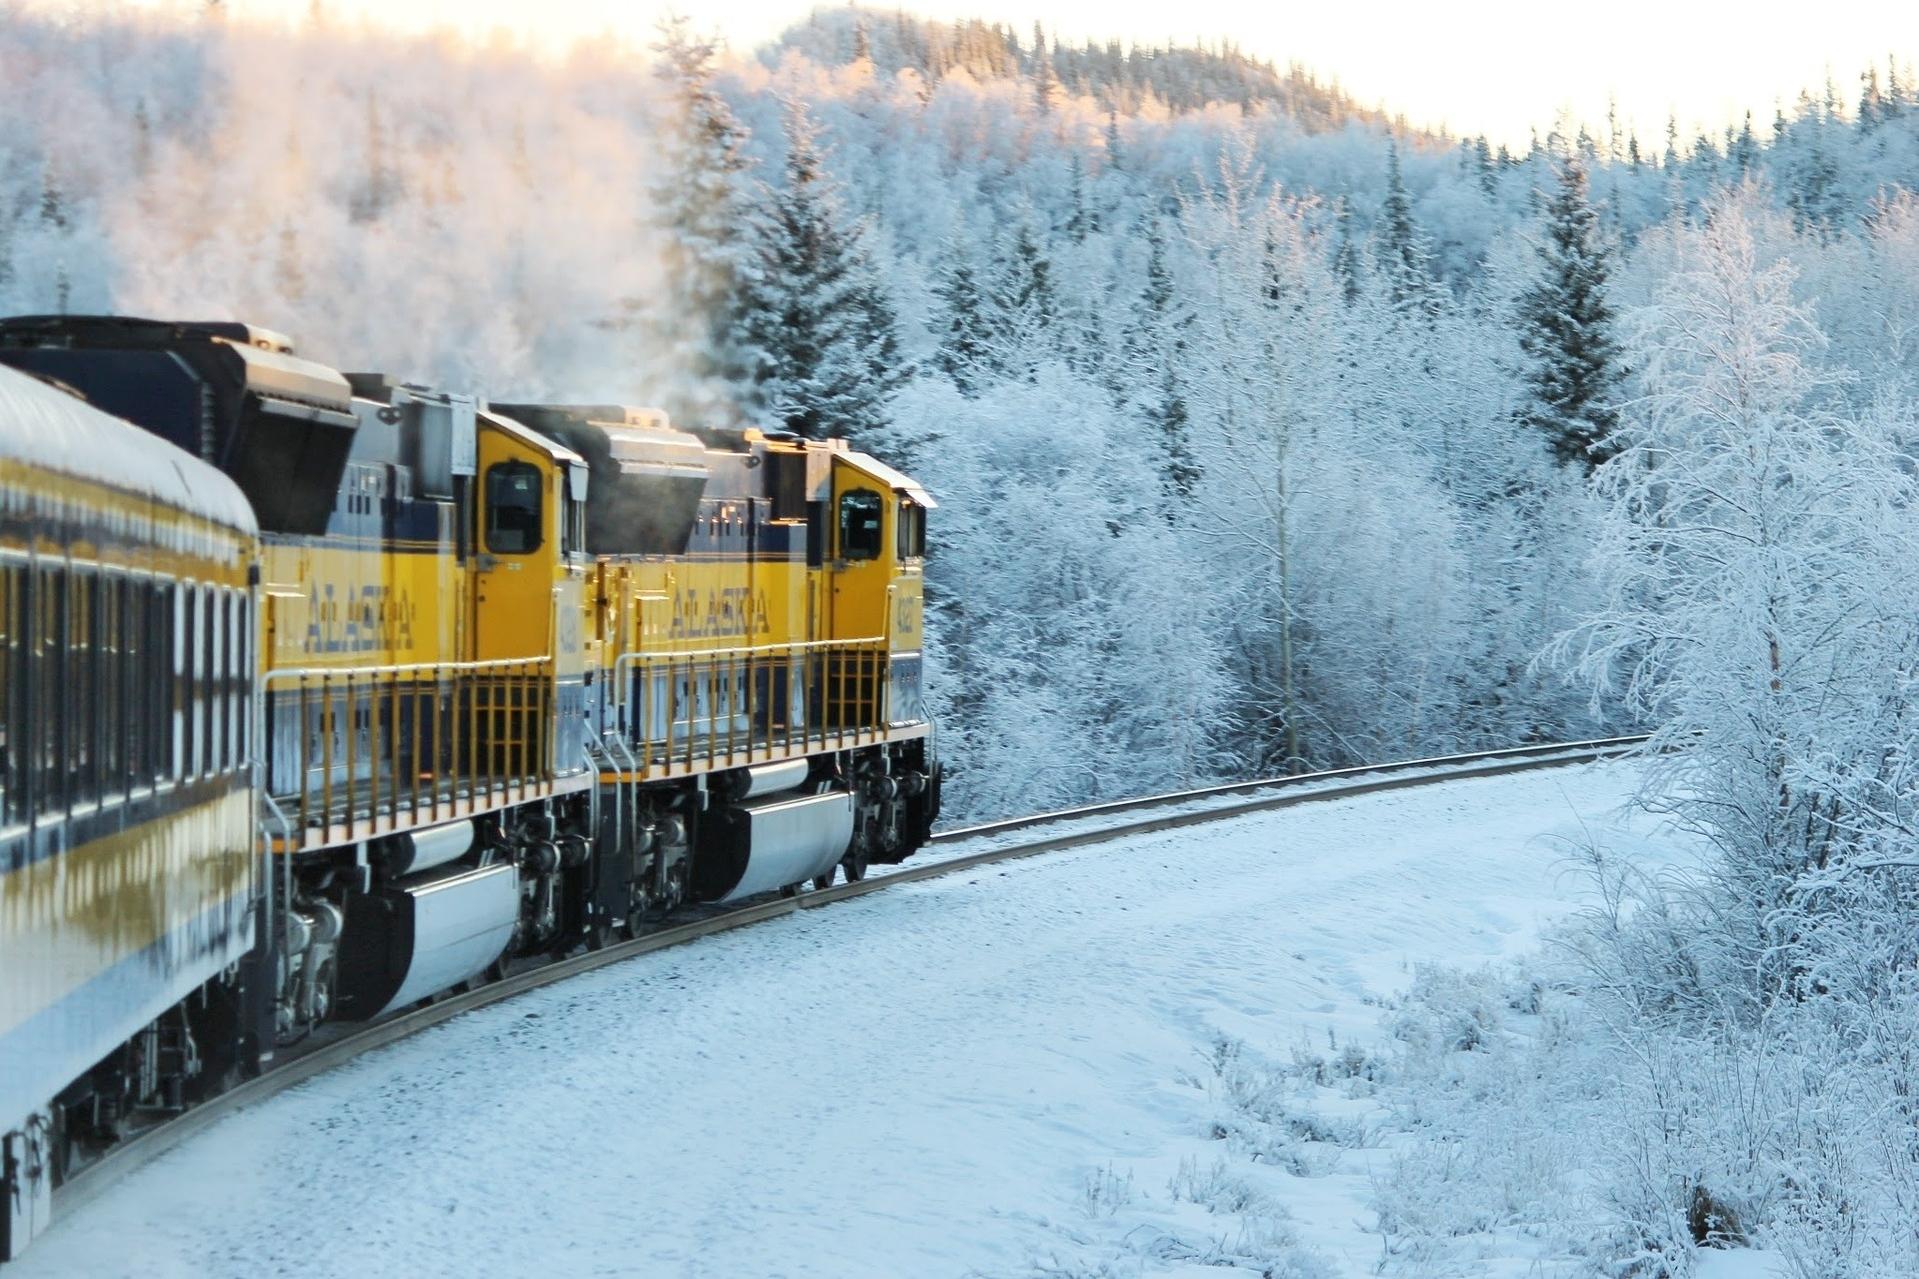 train-668964_1920 (1)